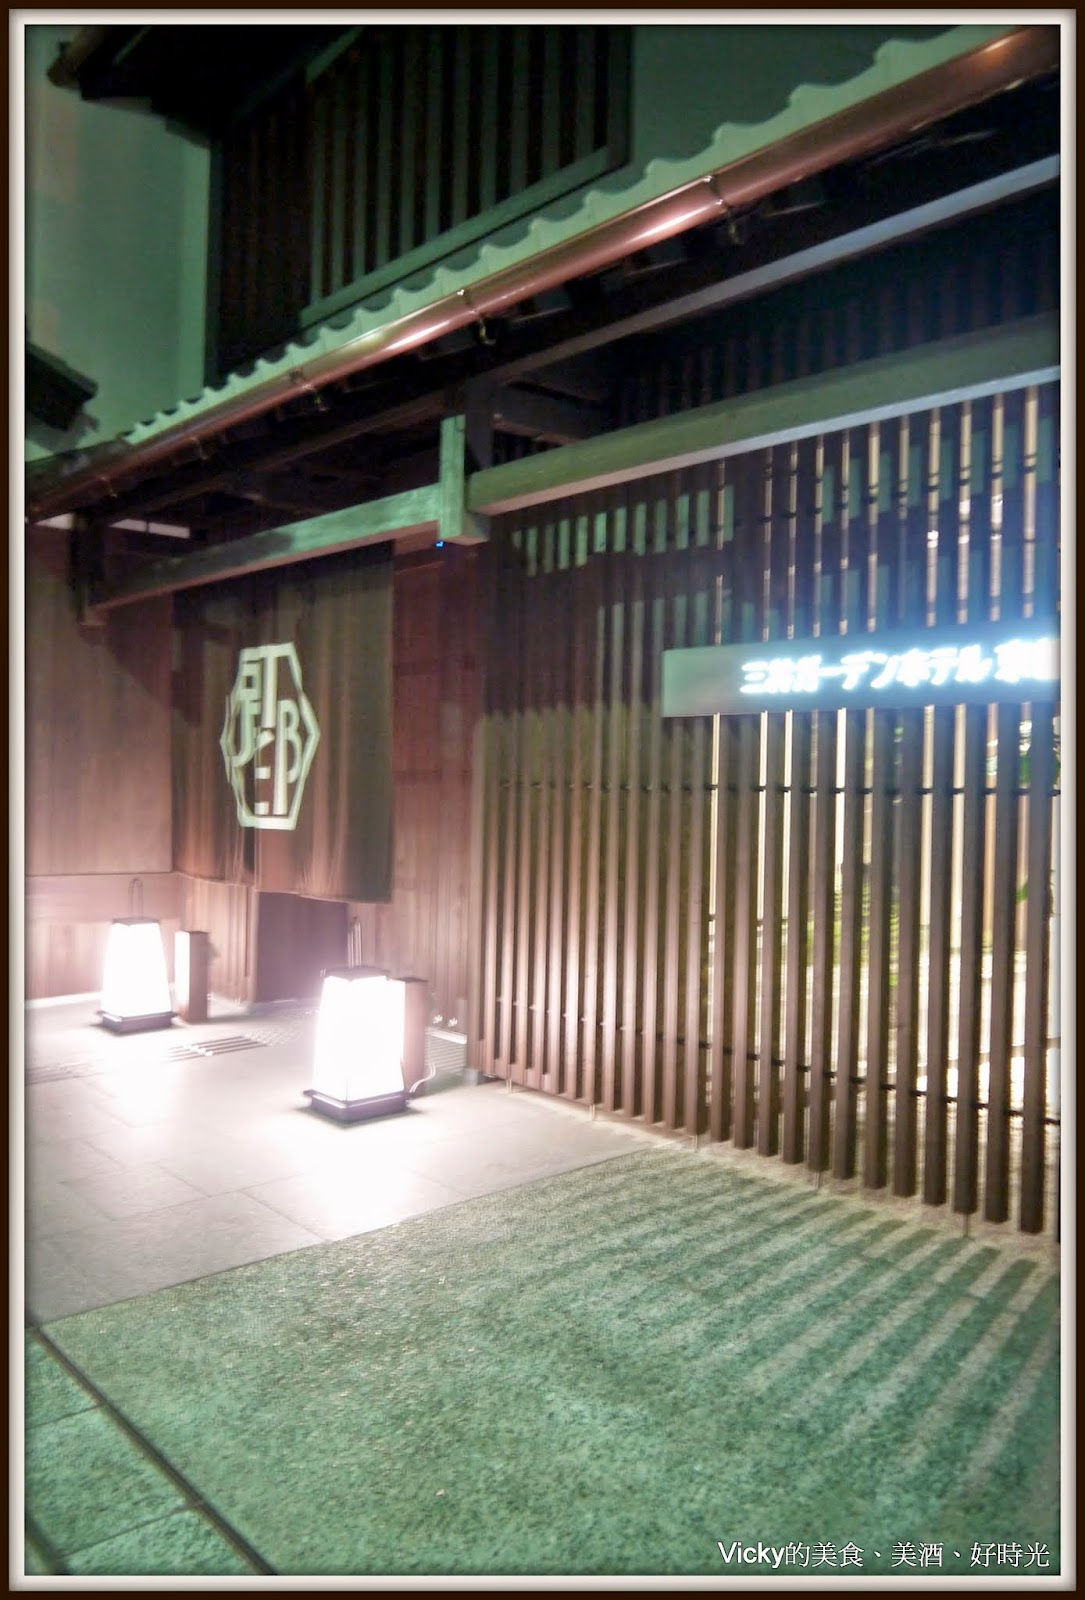 Vicky 2014 Mitsui Garden Hotel Kyoto Shinmachi Bettei